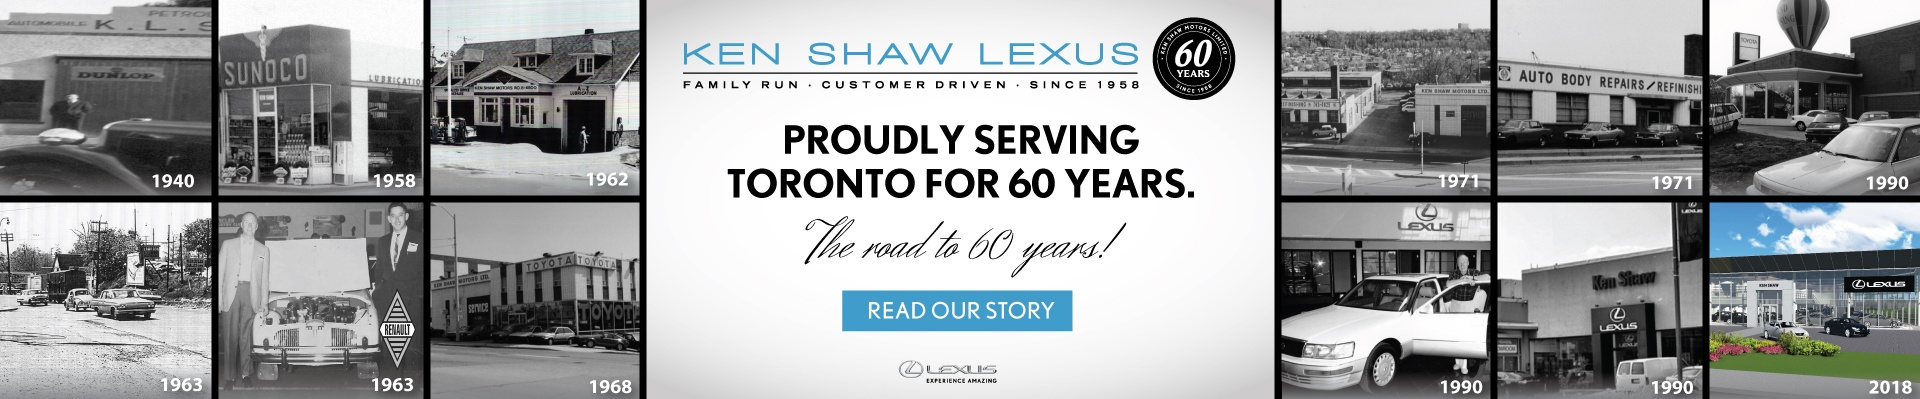 Ken Shaw Lexus New Used Lexus Dealership Toronto ON - Lexus dealership toronto